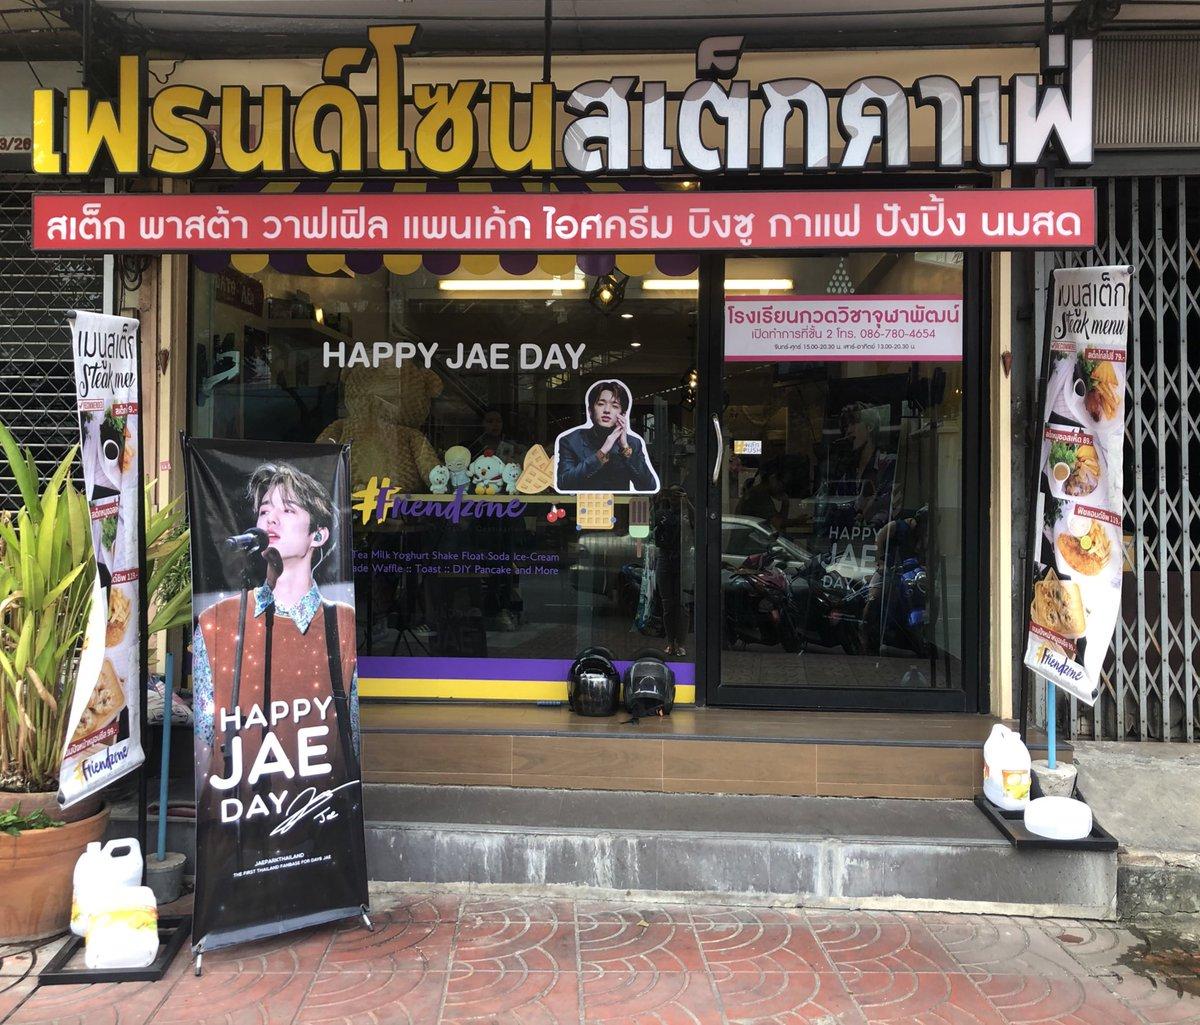 "JAEPARK THAILAND presents   ""𝑻𝒉𝒆 𝑳𝒖𝒎𝒊𝒏𝒂𝒓𝒚""   HAPPY JAE DAY 2019 Projects 14-15 กันยายน 13.00-21.00 น. Friend Zone Dessert Cafe  ✧✦✧✦✧✦✧✦✧✦✧✦✧✦  คาเฟ่เปิดแล้วน้า~~   #Jae_the_luminary #HAPPYJAEDAY #JAE #DAY6<br>http://pic.twitter.com/mmntxMria1"